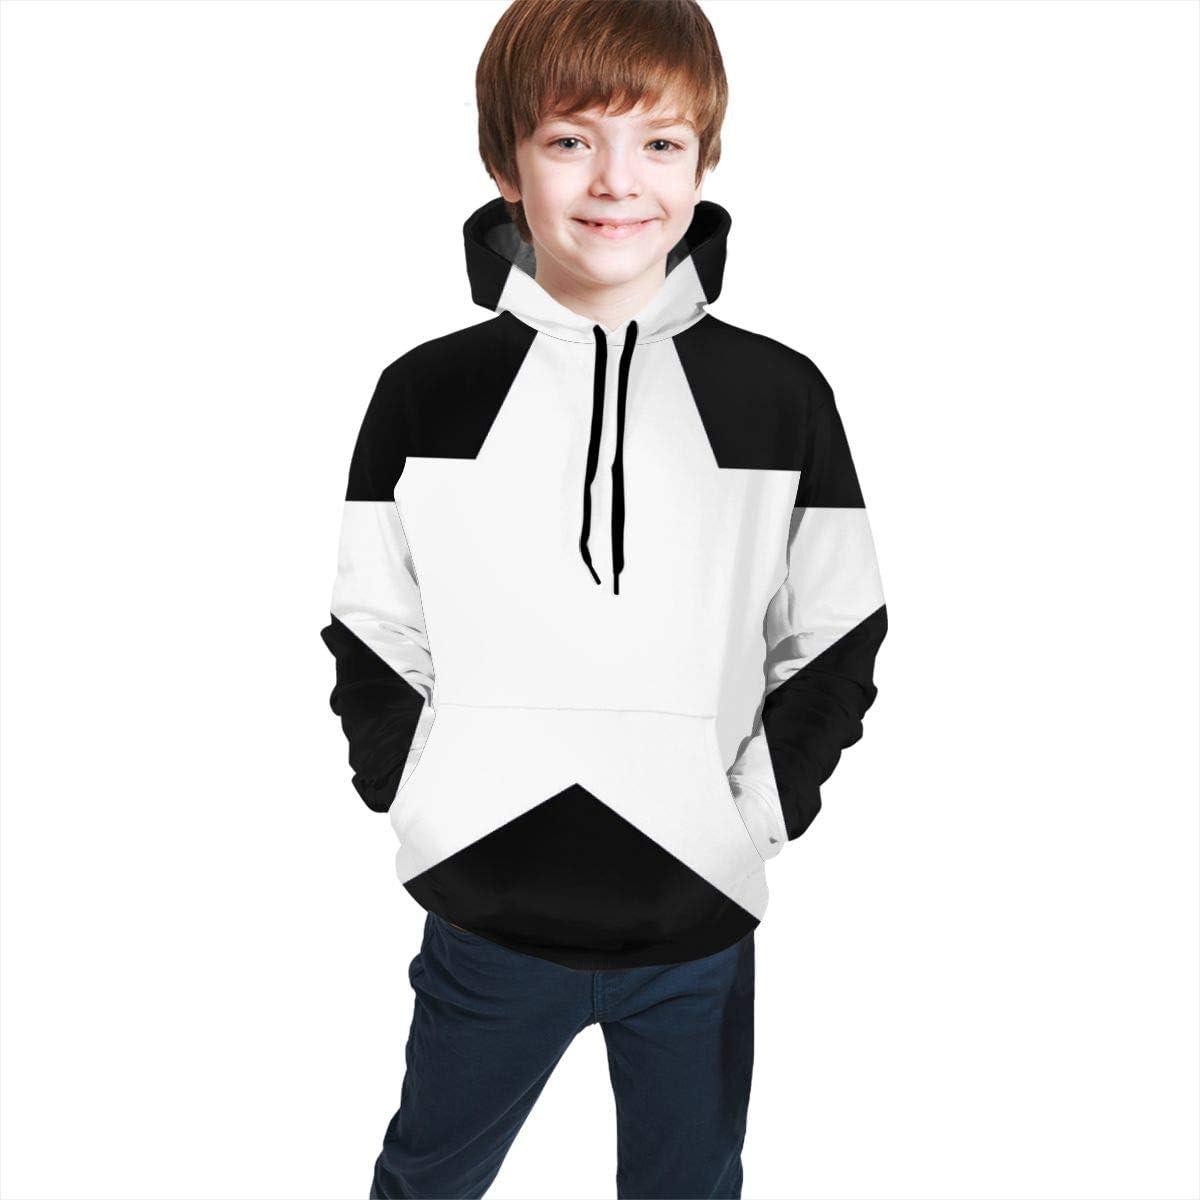 Bestpillow Sweater tee Girls and Boys White Star Hoodie